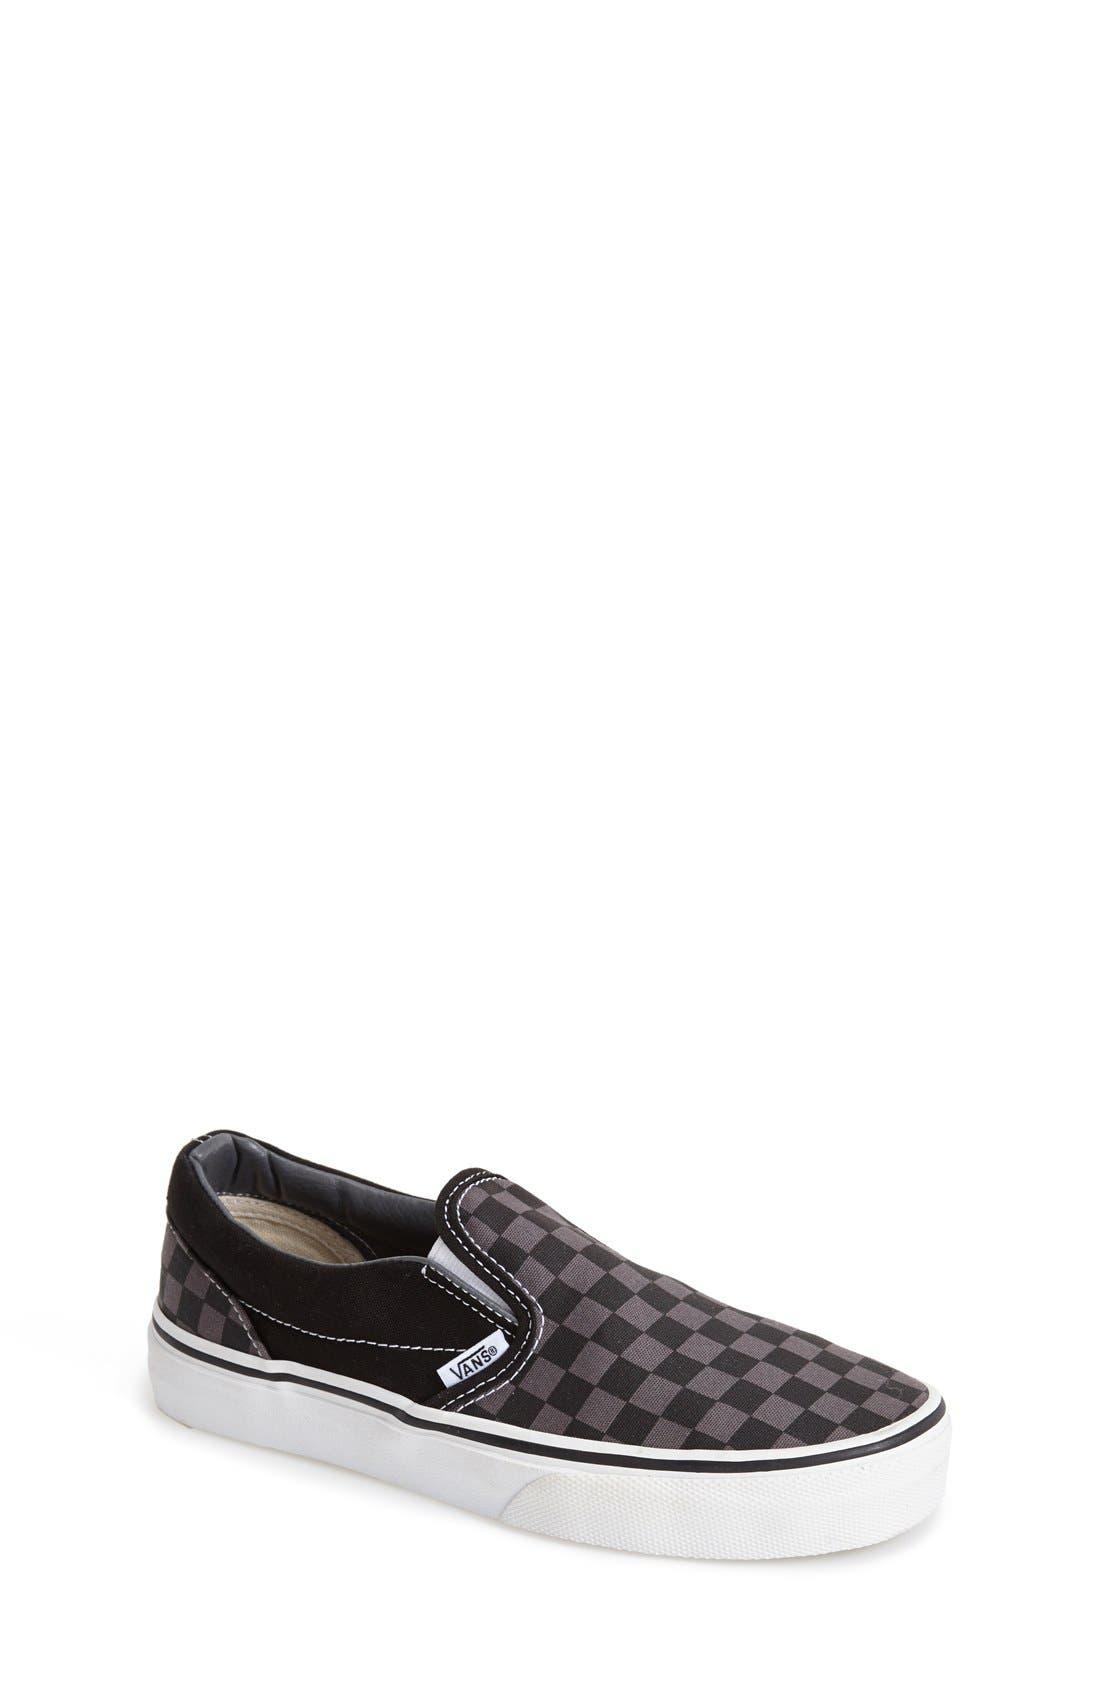 'Classic - Checker' Slip-On,                         Main,                         color, CHECKERBOARD/ BLACK/ PEWTER